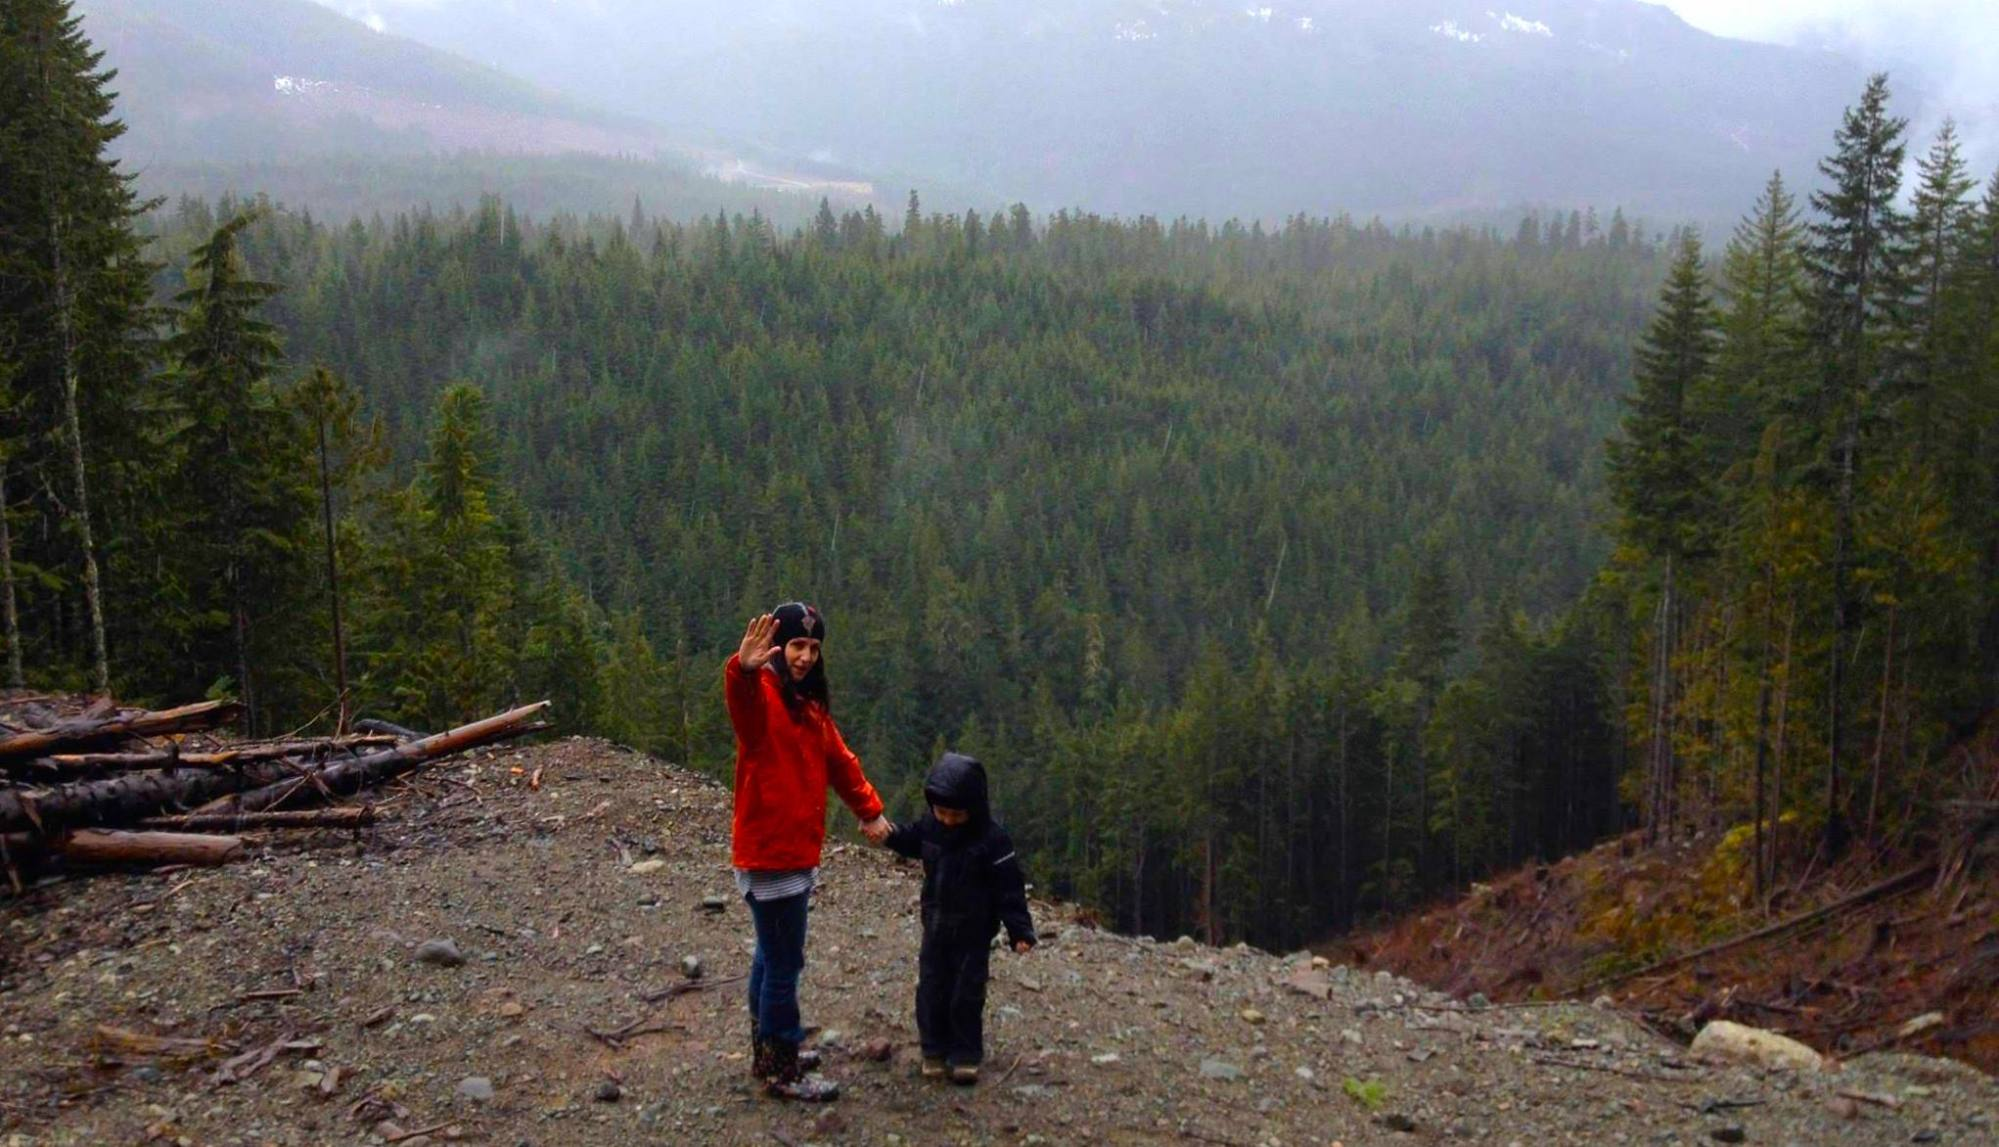 SpiritMAMA with Son in Forest | SpiritMAMA Blog